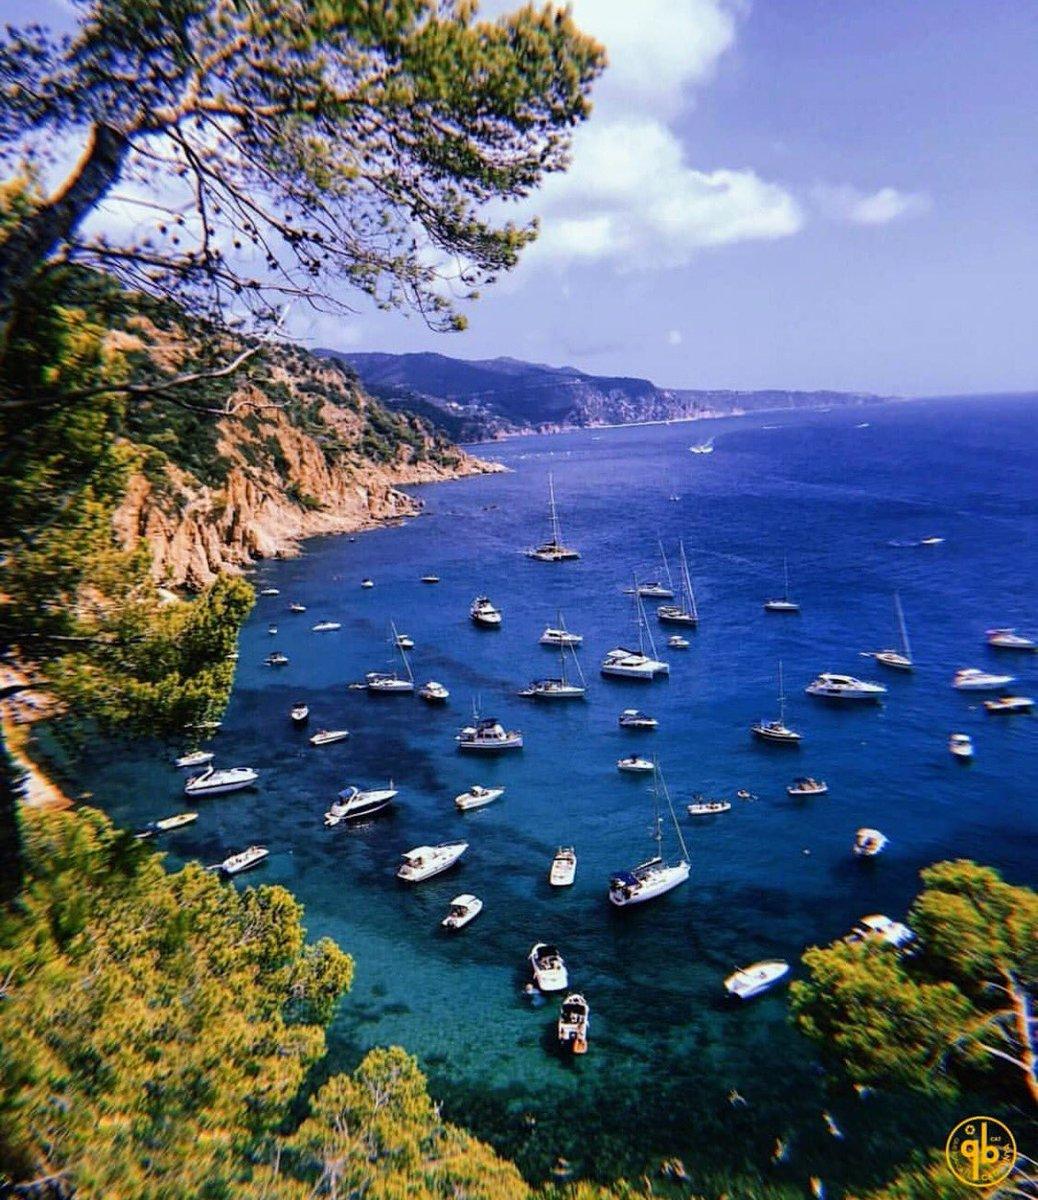 RT @Mardelplata1995: It's Tossa de mar, one of the best coastal place in Costa Brava! 💙 #TossaDeMar #CostaBrava #VisitCostaBrava alquilatulimo.com @visitcatalonia